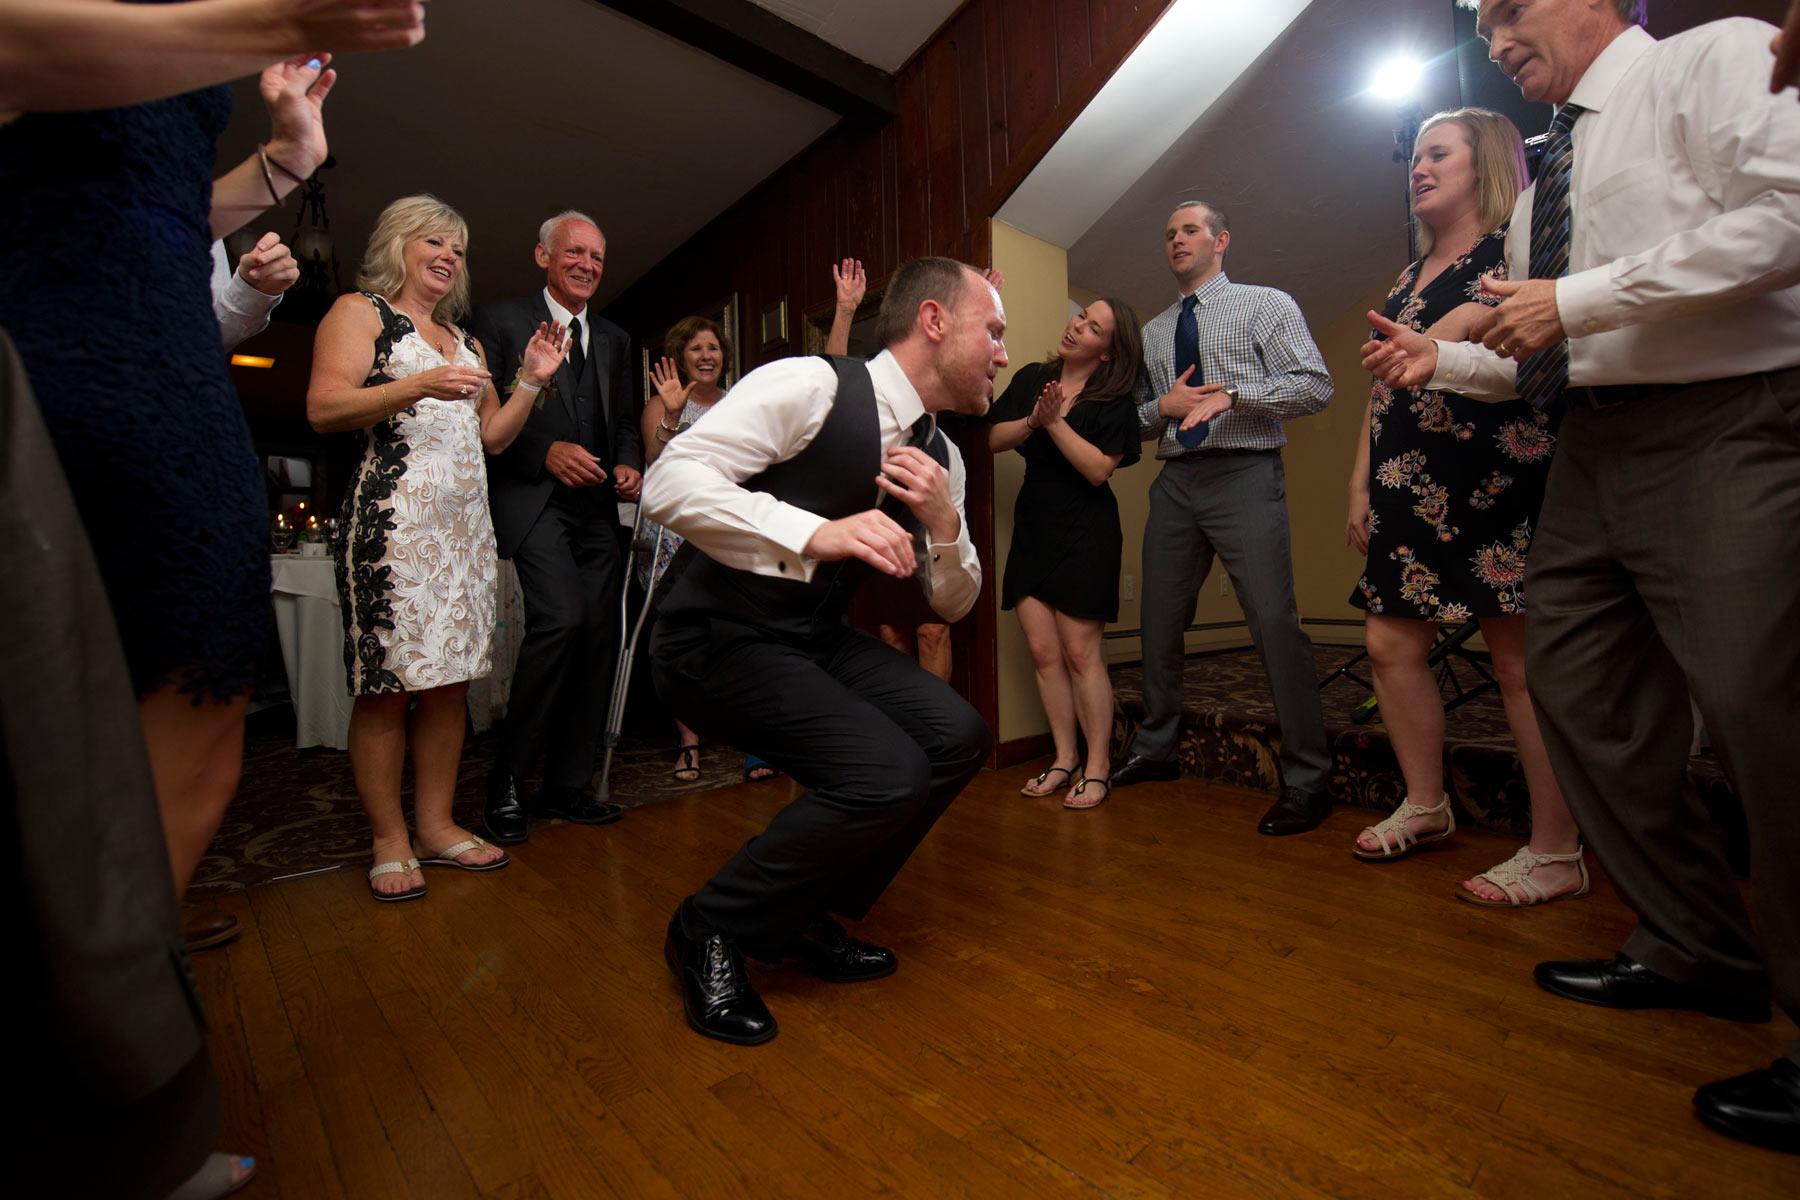 Bucks_County_wedding_photographer_Stroudsmoor_country_inn_wedding_Philadelphia_wedding_photographer_33_dance_breakdown.JPG